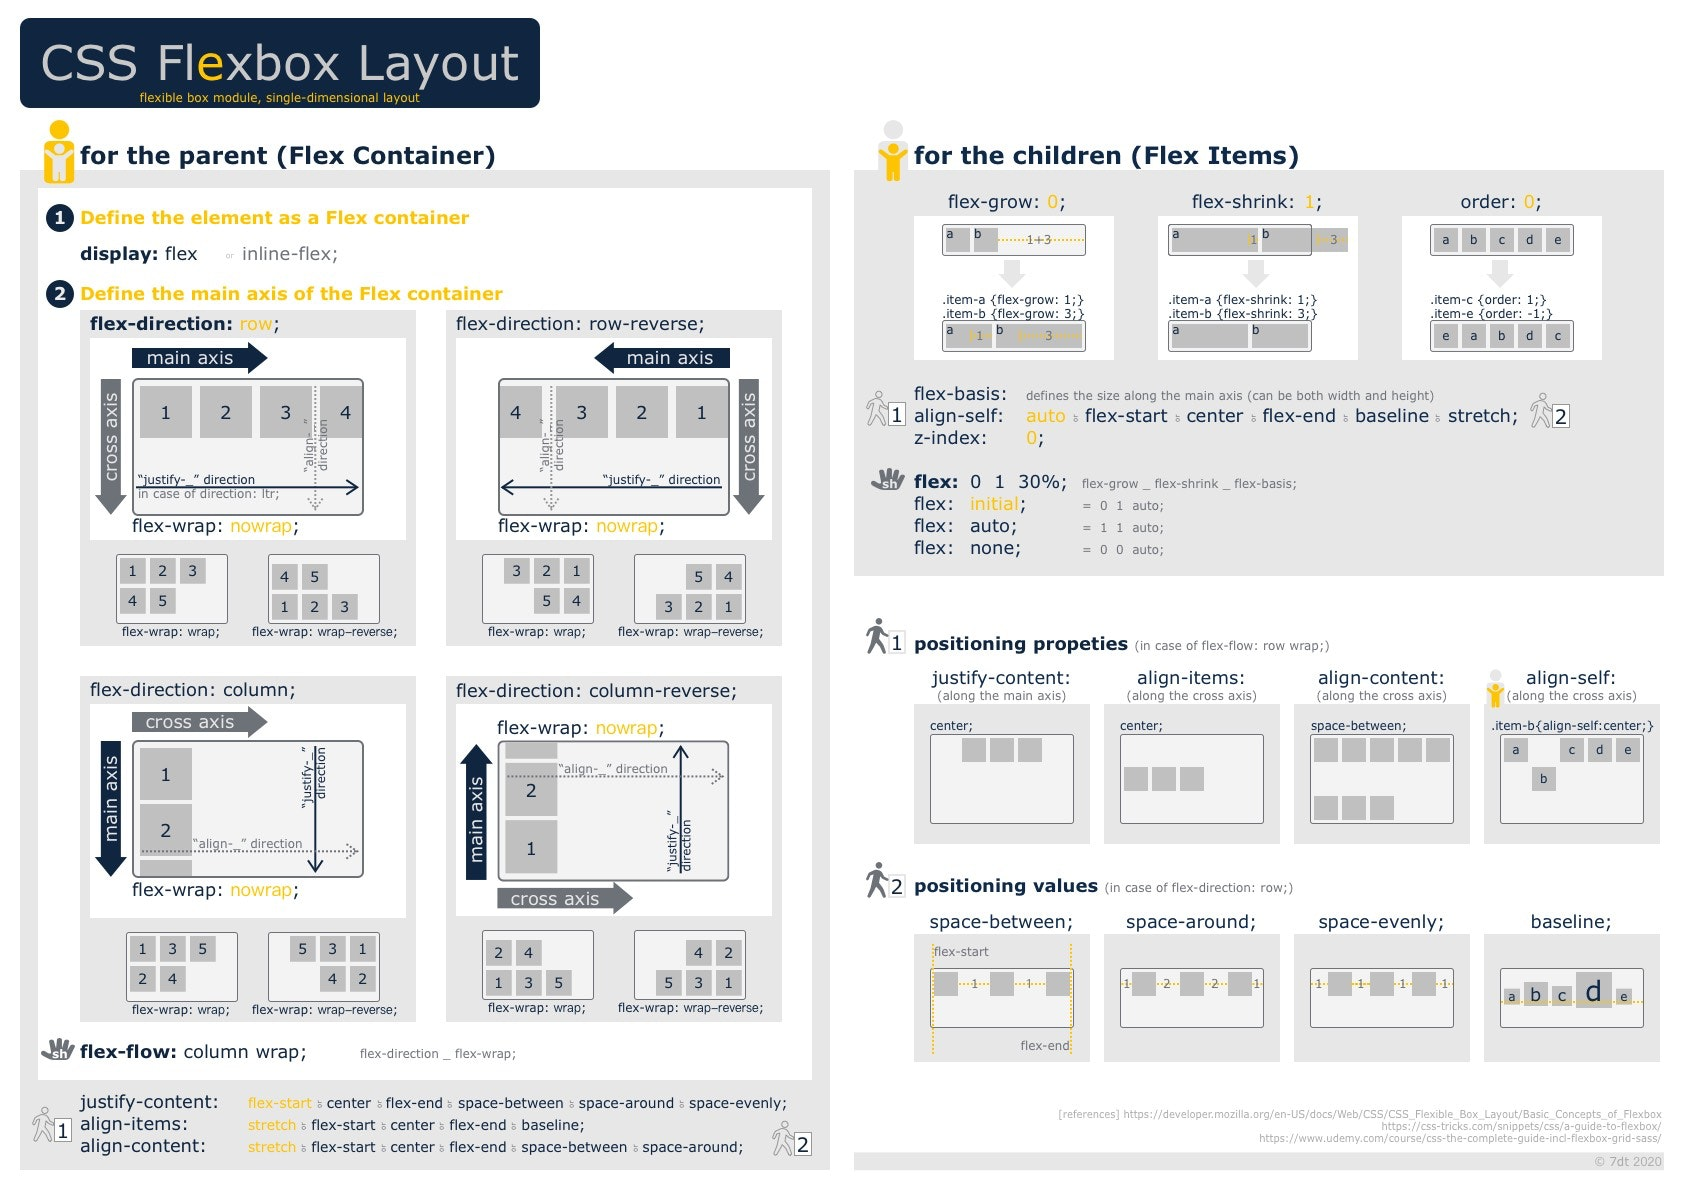 flexbox cheat sheet.jpg